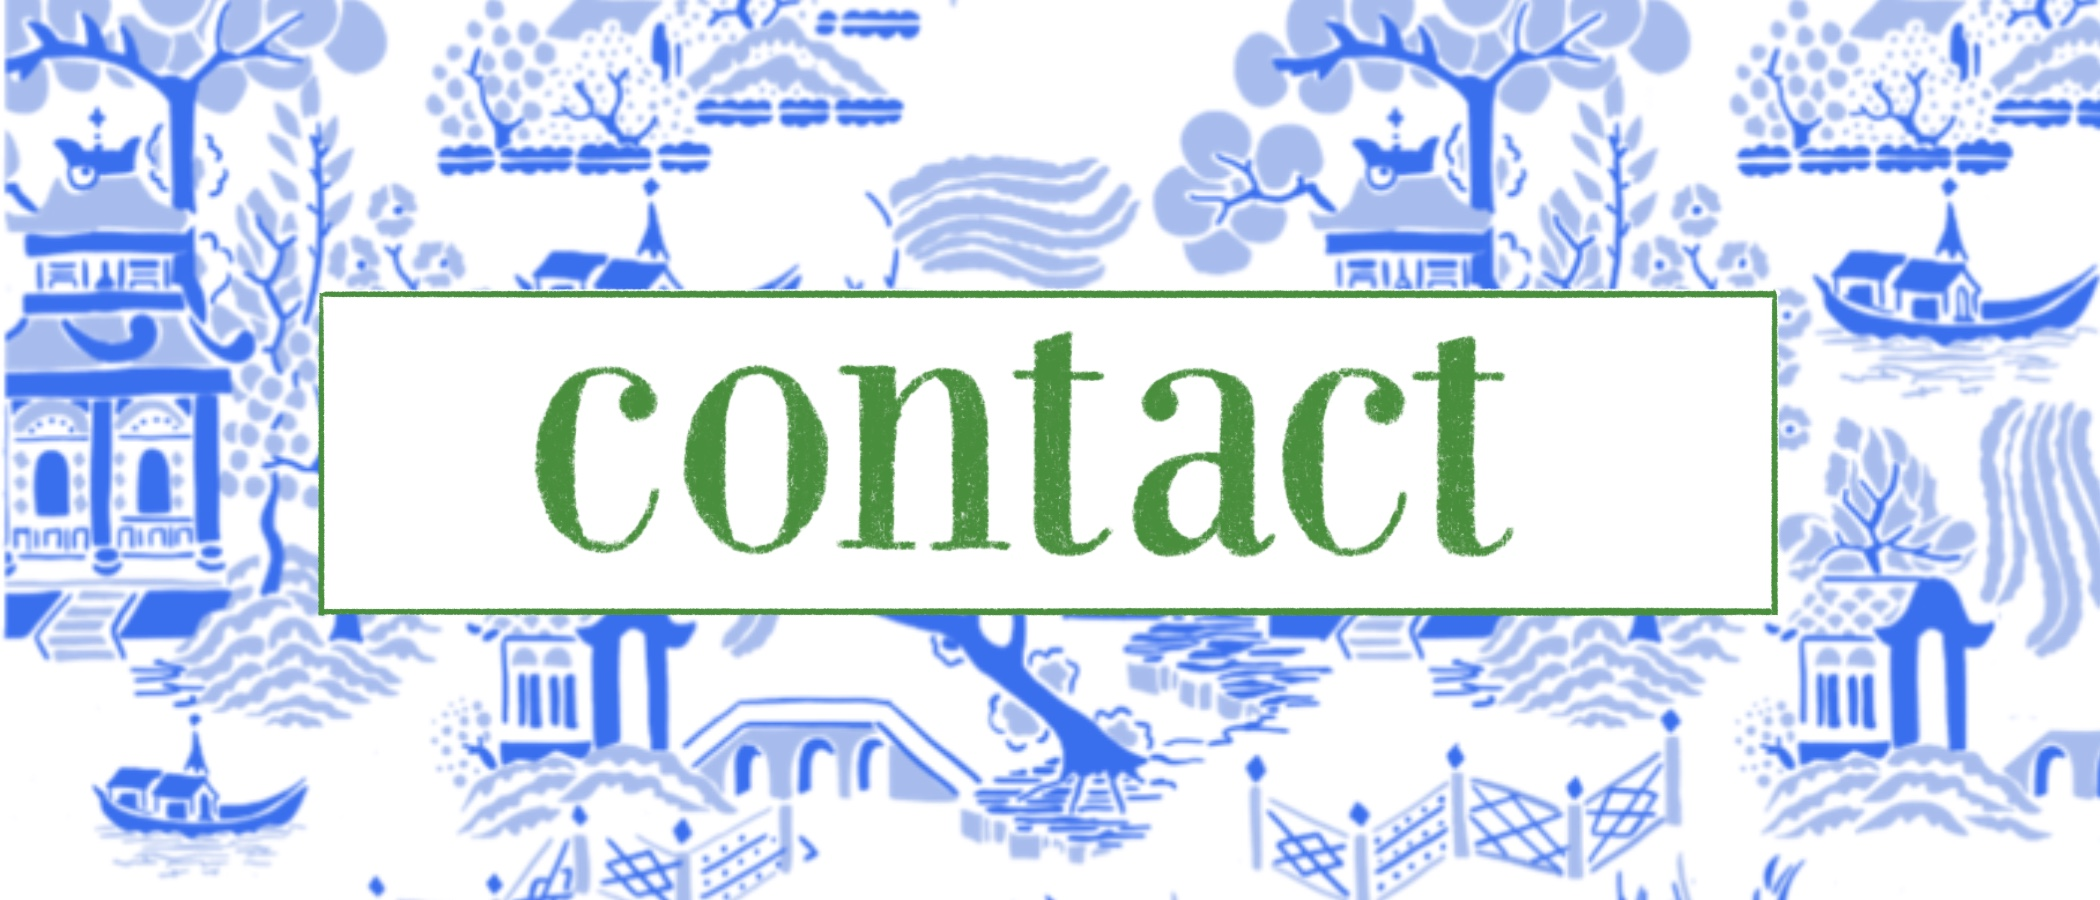 contact banner.jpeg